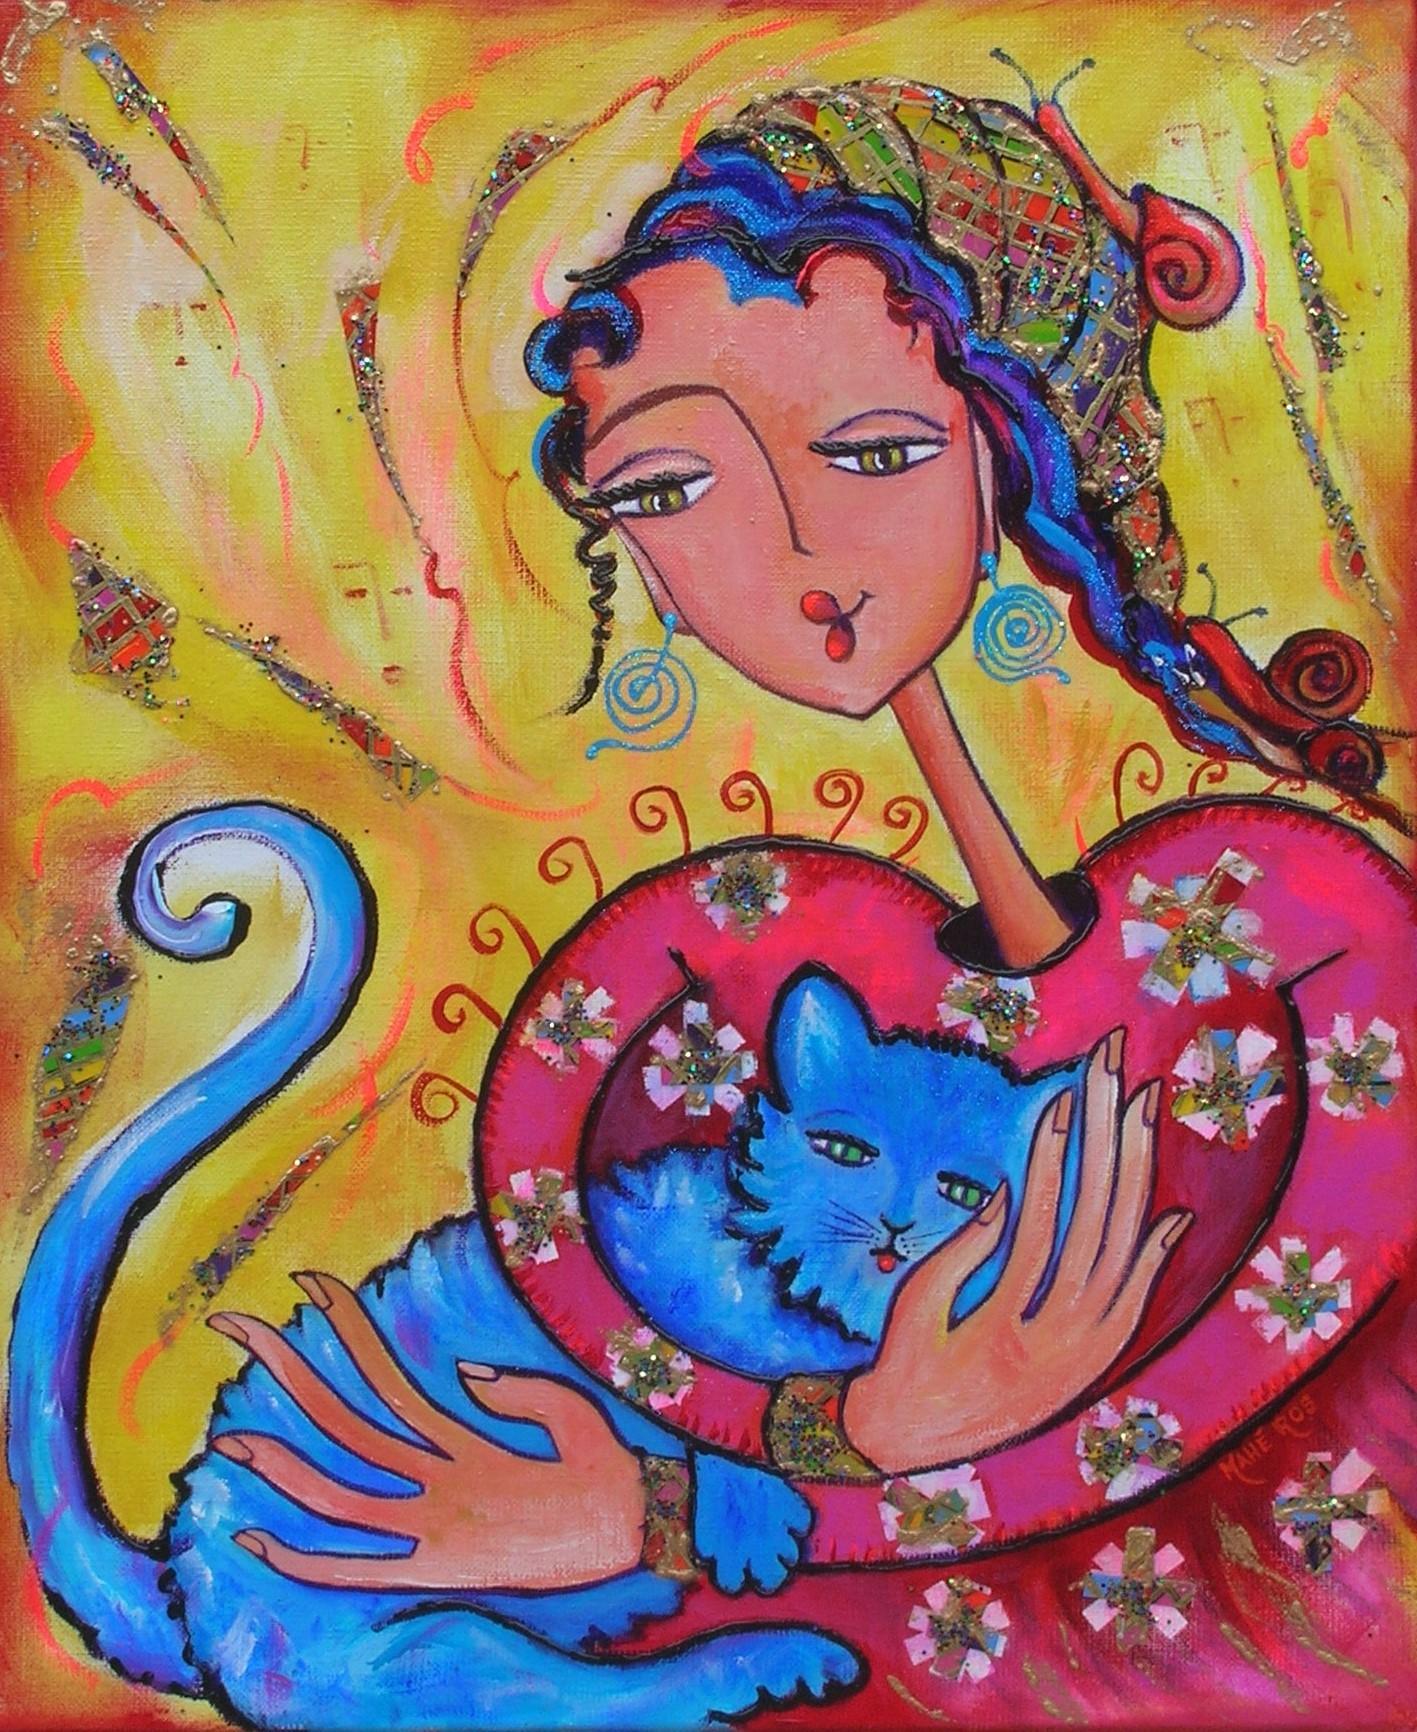 Jeune fille au chat bleu - vendu